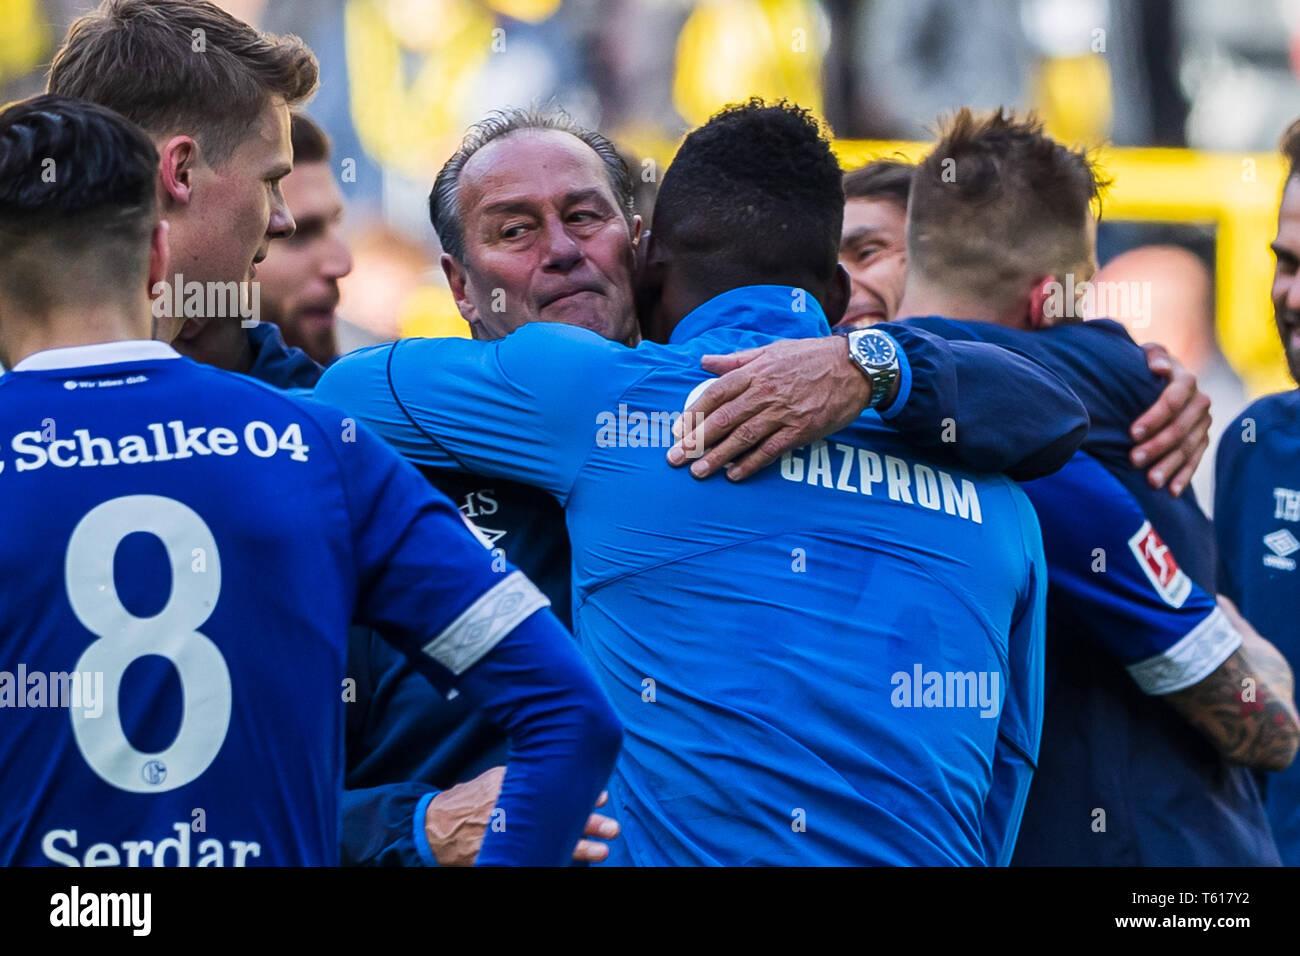 27 april 2019 Dortmund, Germany Soccer German Bundesliga Borussia Dortmund v Schalke 04   Huub Stevens coach (Schalke 04) - Stock Image